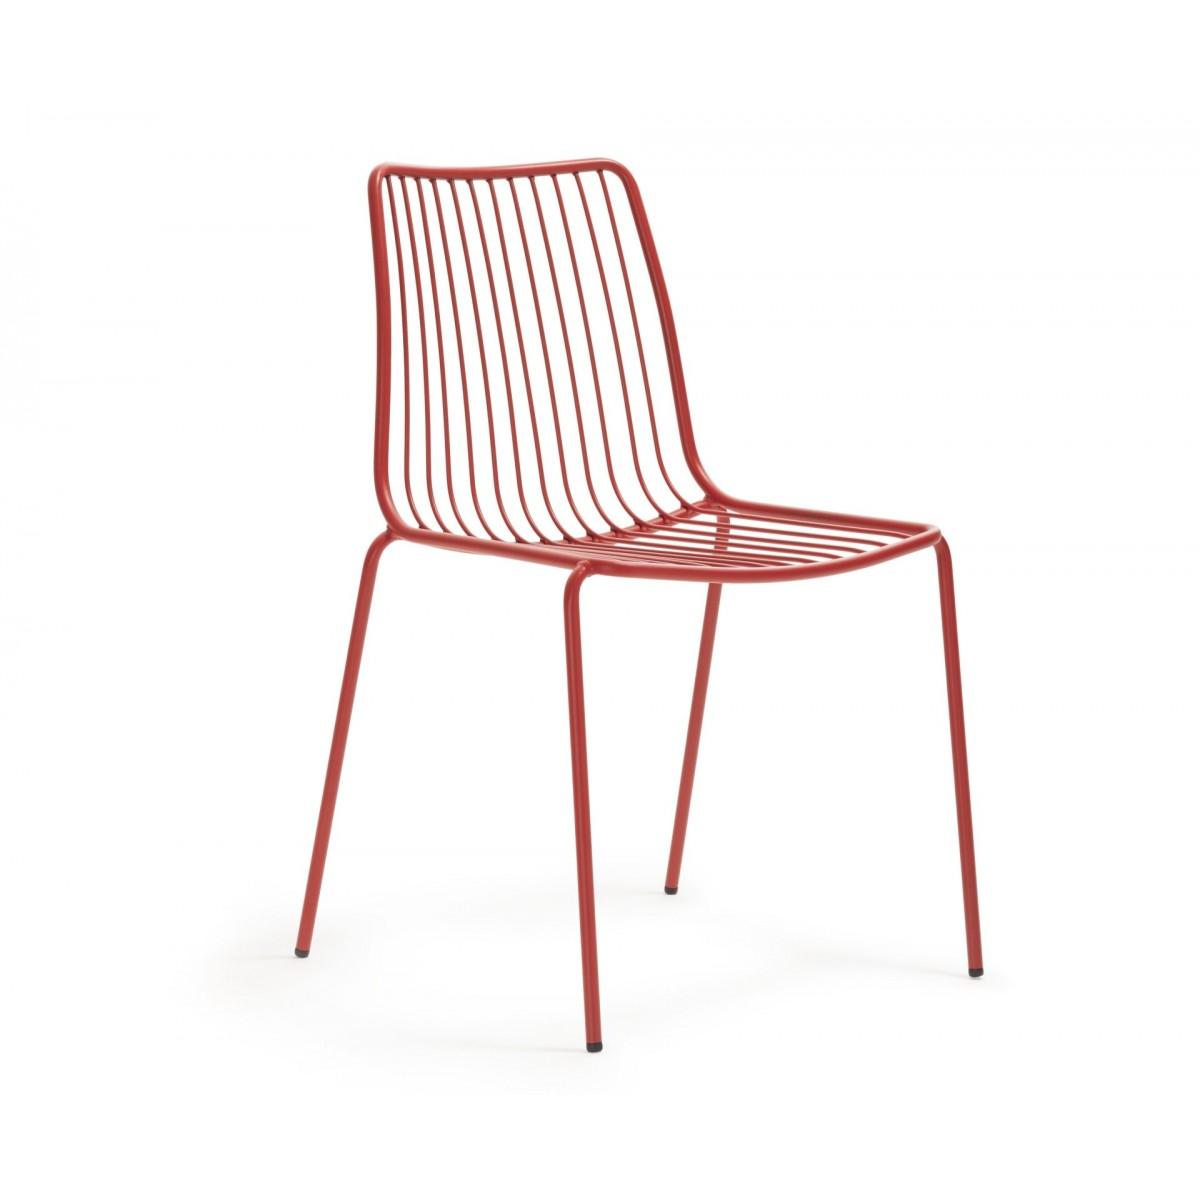 stuhl rot metall stapelbar gartenstuhl rot metall. Black Bedroom Furniture Sets. Home Design Ideas